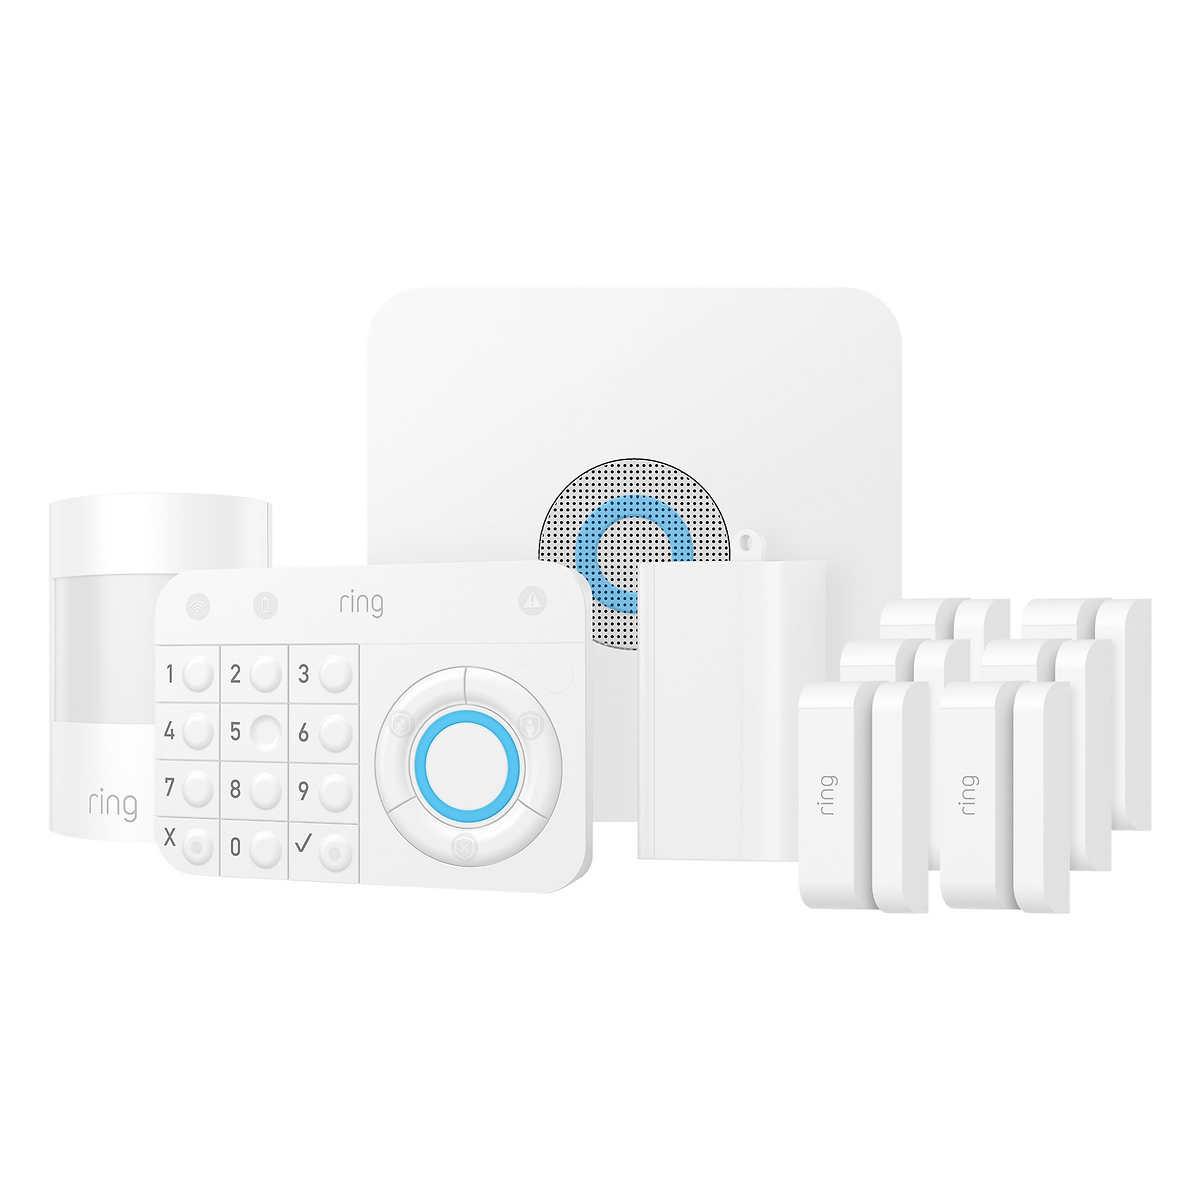 Costco Members 10 Piece Ring Alarm Wireless Security Kit